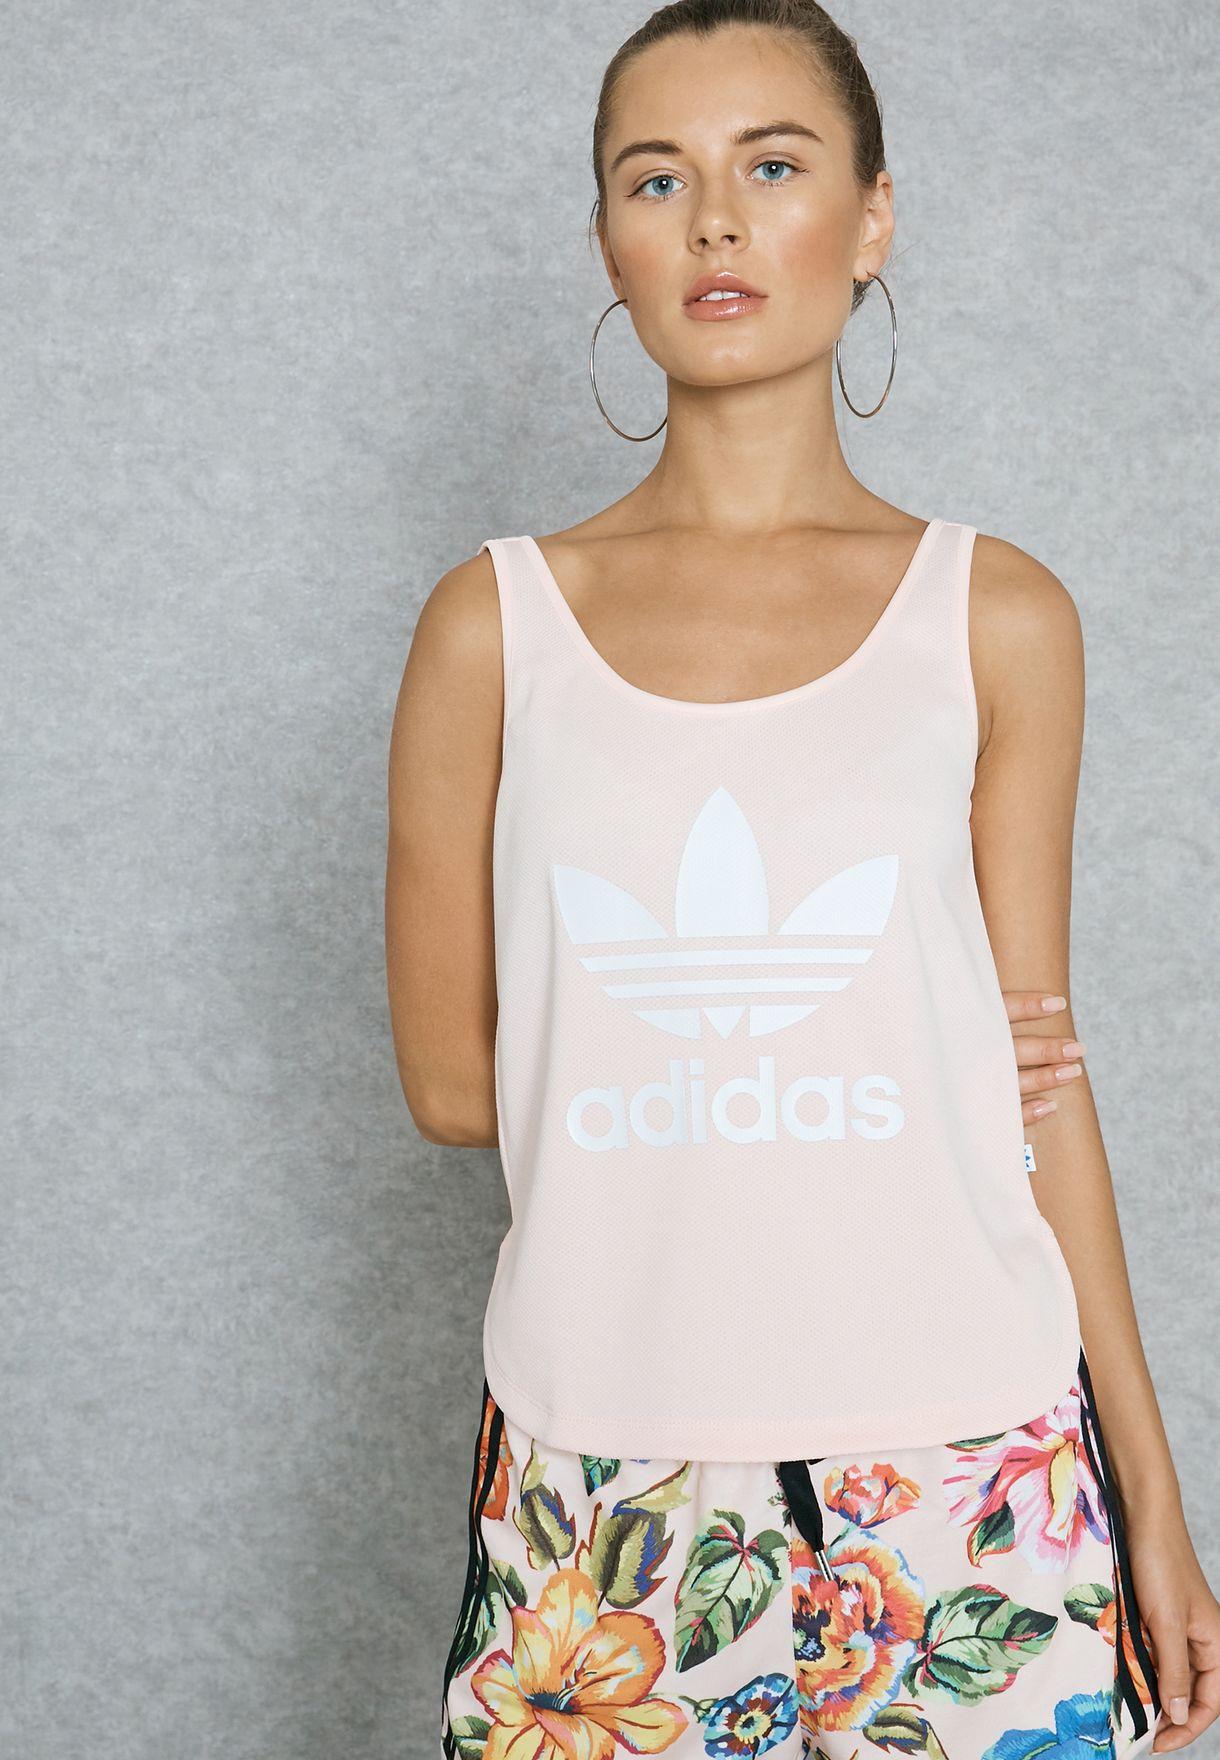 b6565e98a8eba Shop adidas Originals pink Loose Crop Tank Top BP9379 for Women in ...